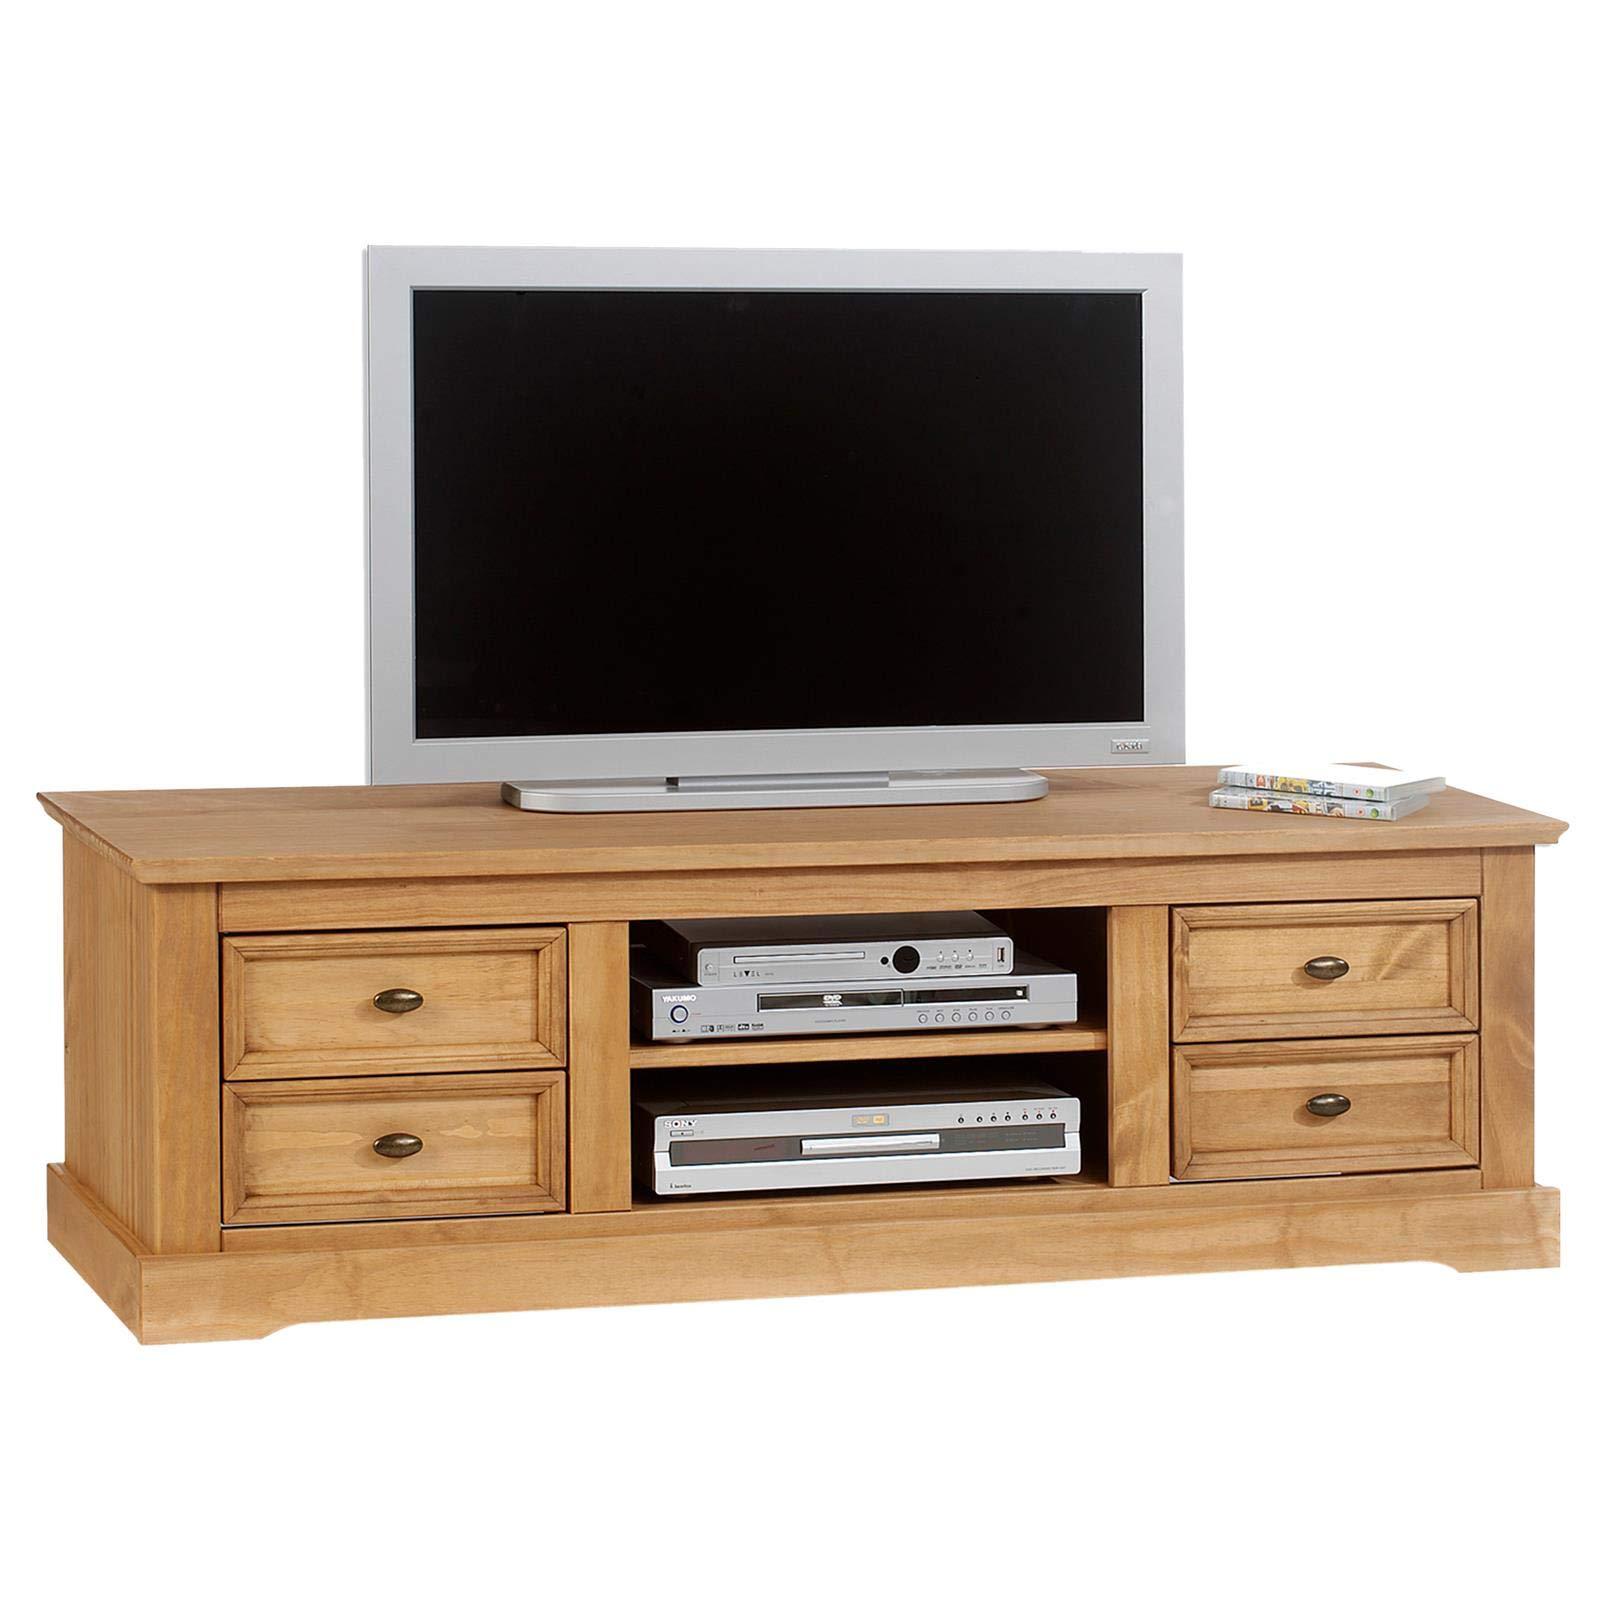 idimex tv lowboard kent aus kiefer massiv fernsehschrank tisch element bank rack hifi mobel